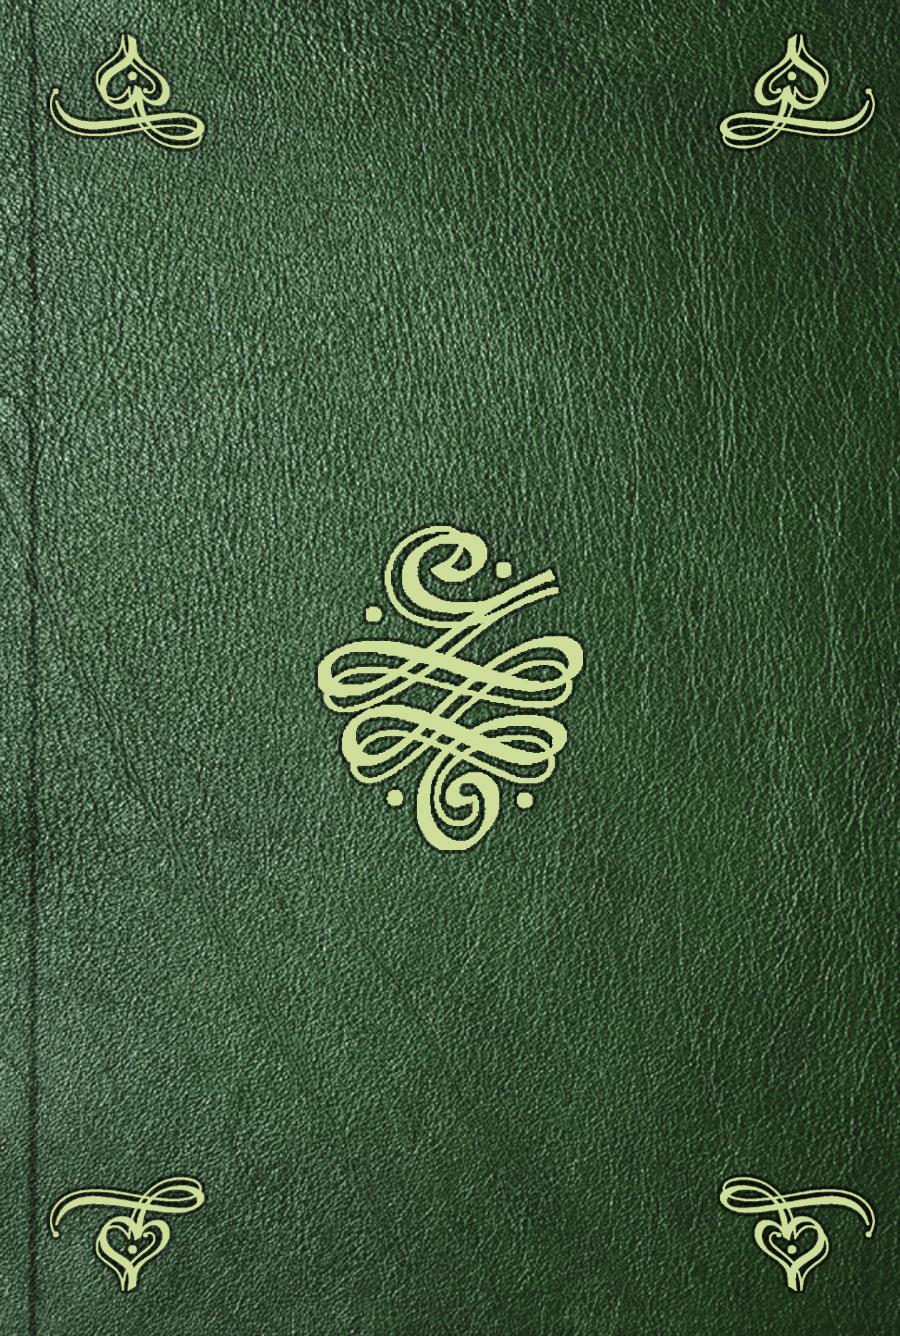 Фото - Рене Декарт Oeuvres de Descartes. T. 2 декарт рене декарт собрание сочинений